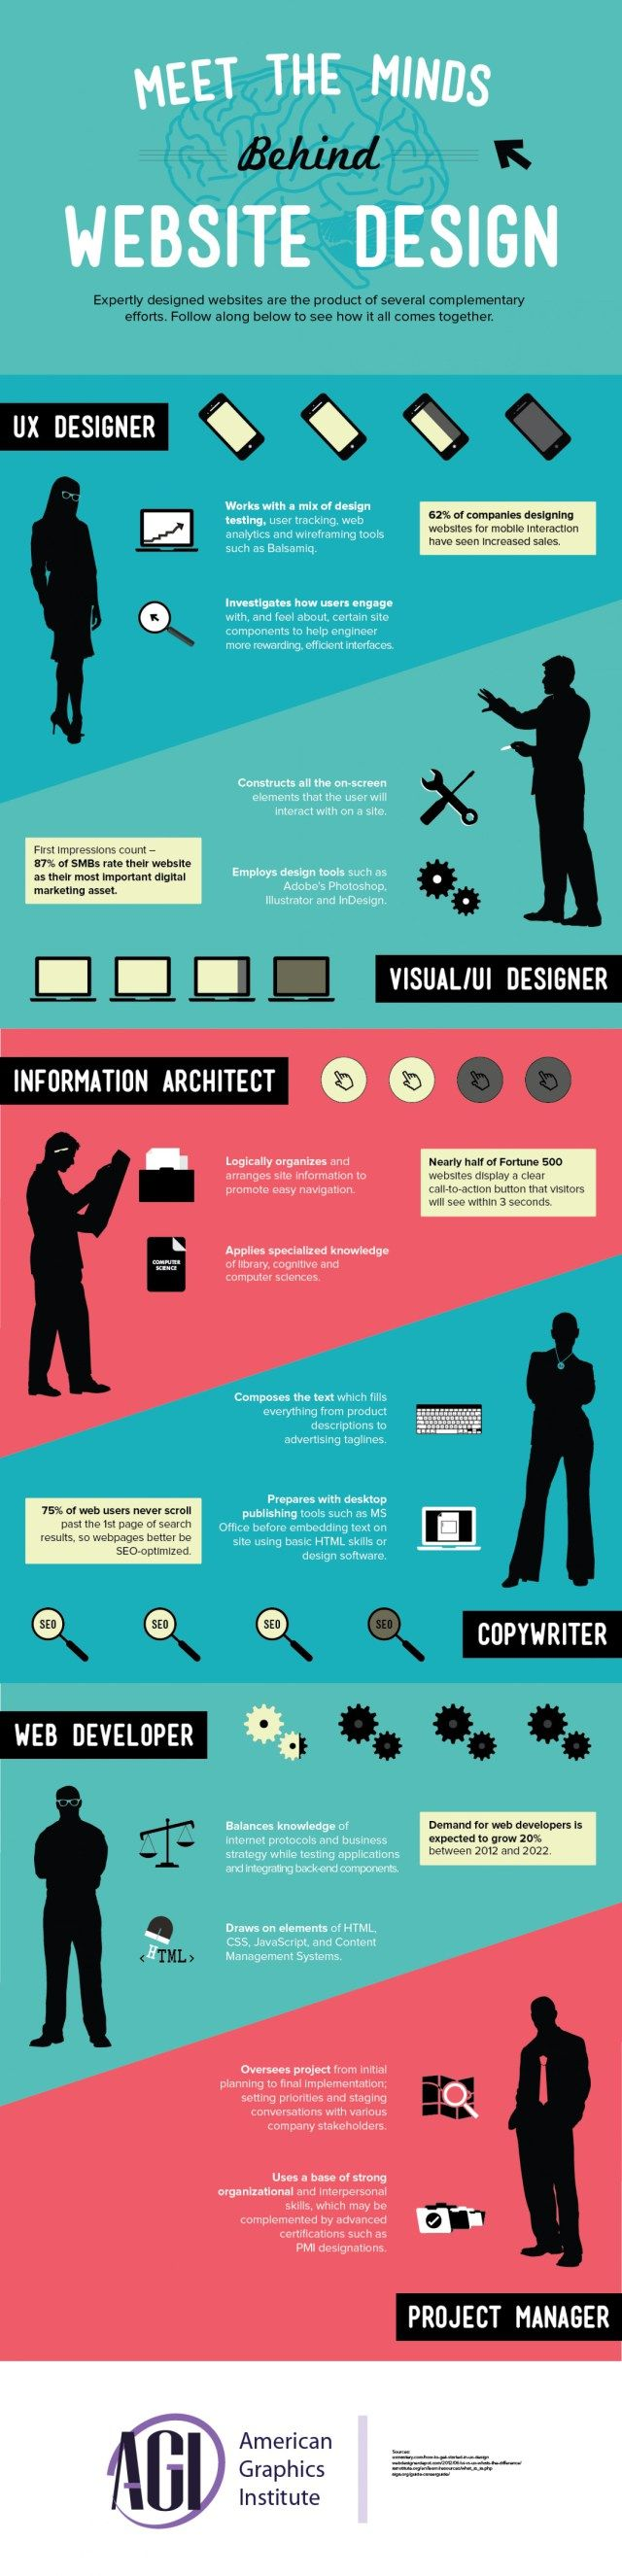 Meet the minds behind Website design #infografia #infographic #design